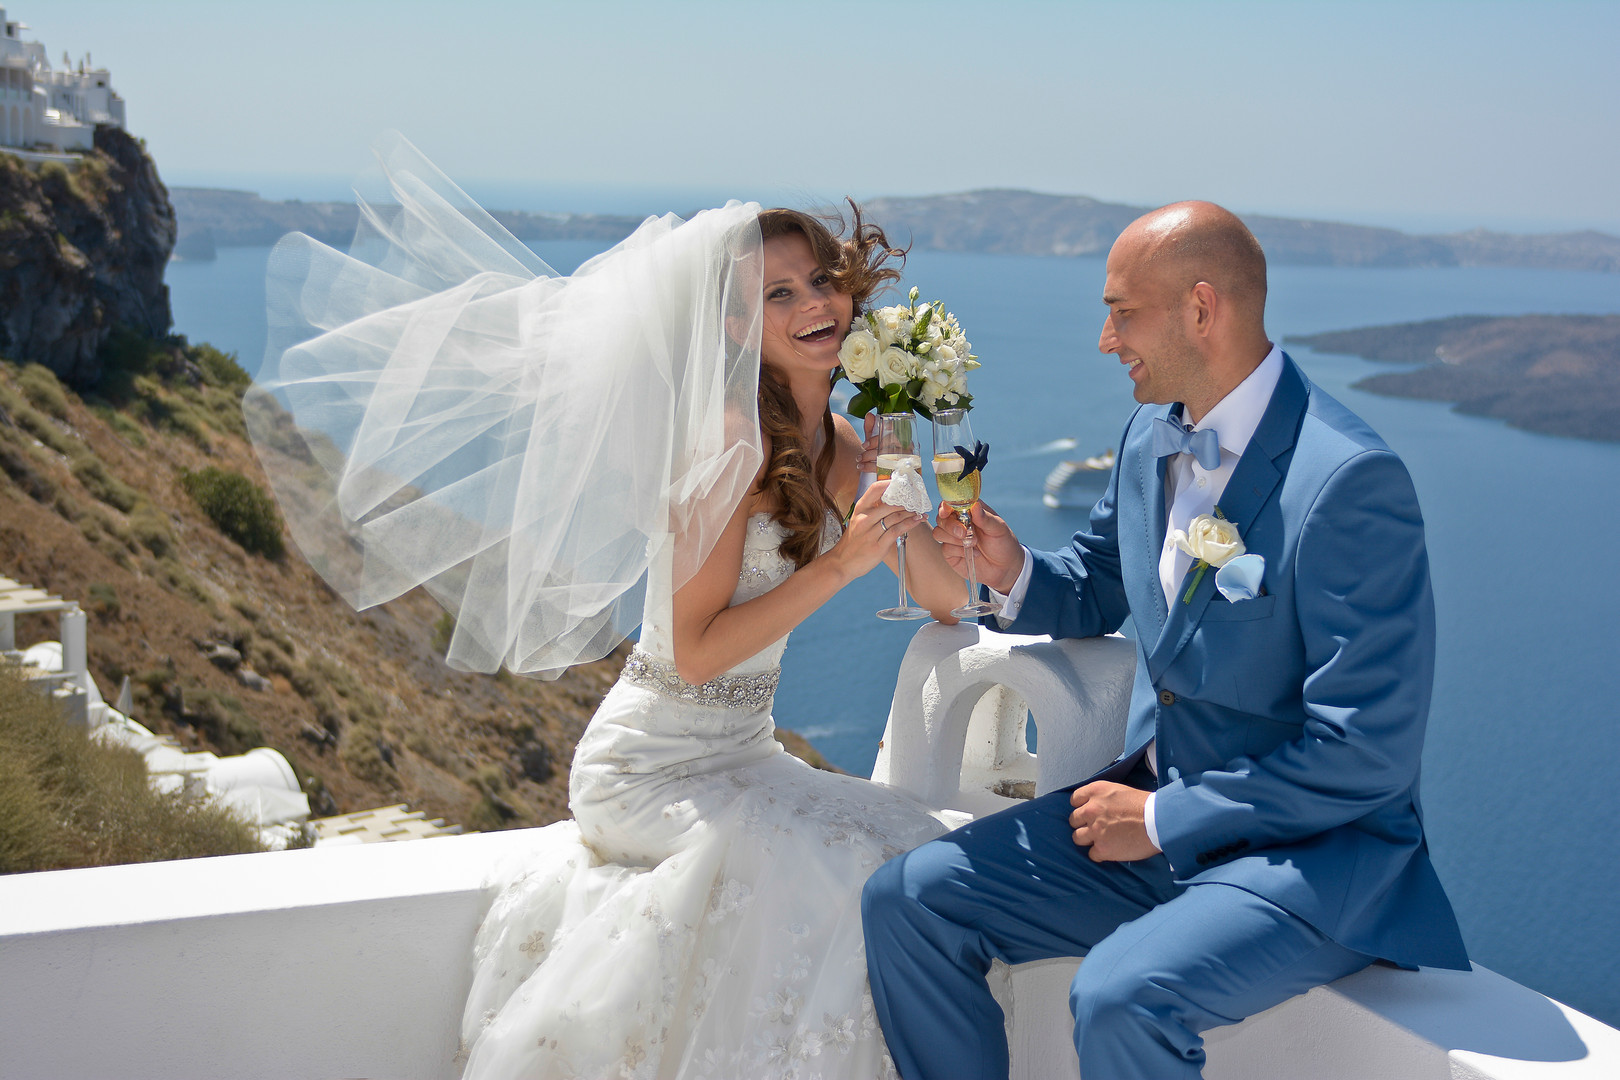 Weddings at Dana Villas